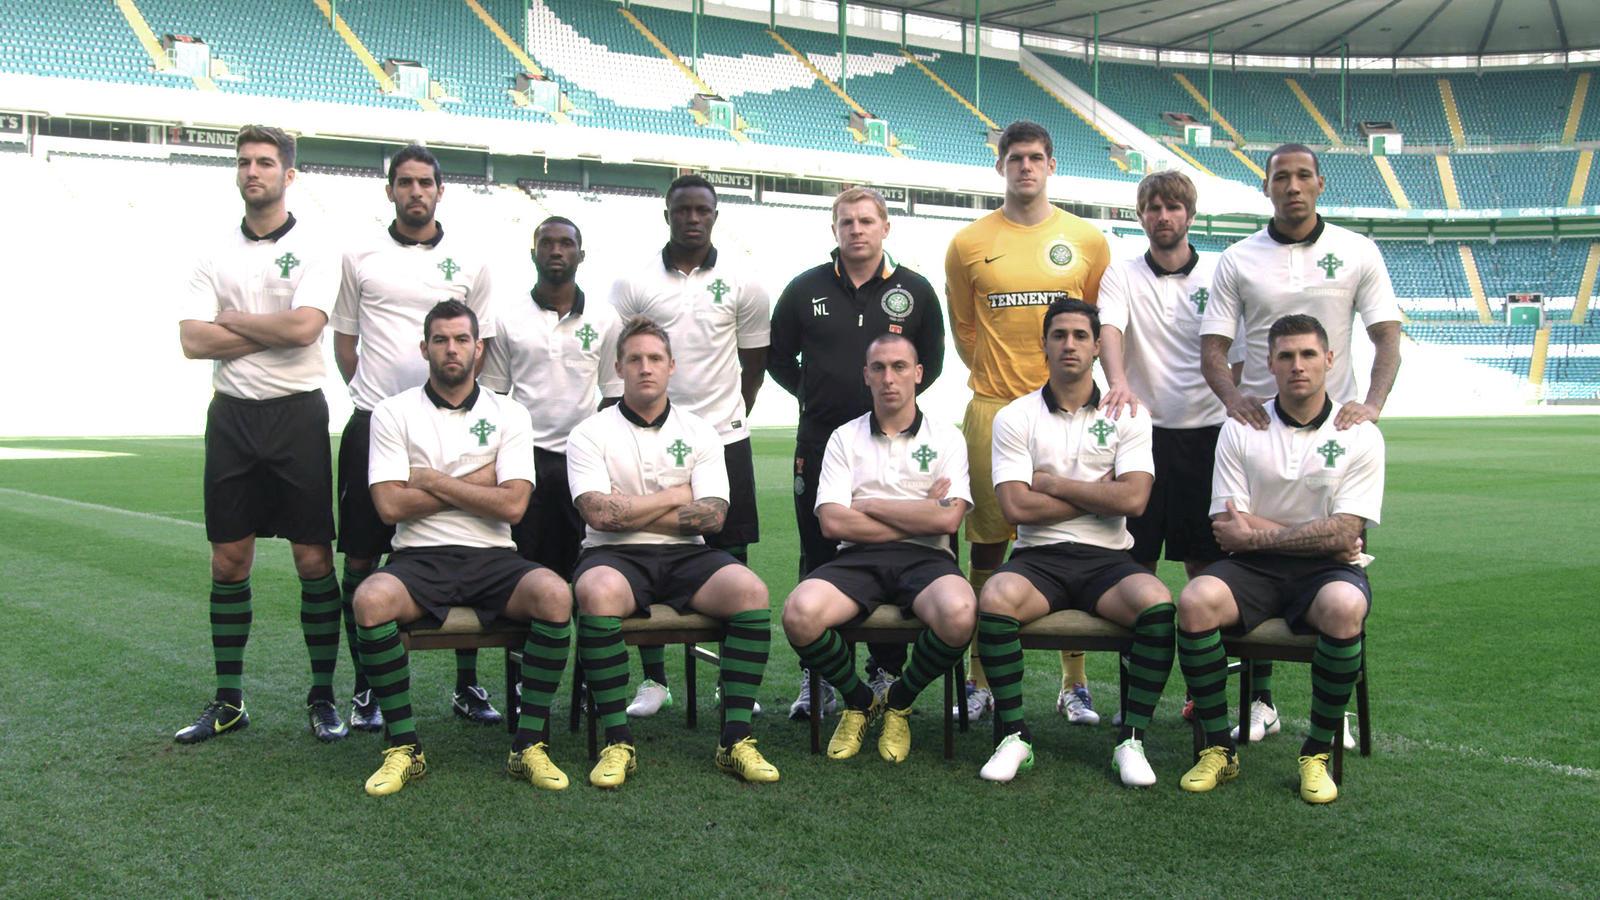 big sale b911f 34e96 Celtic Football Club Launch 125th anniversary kit - Nike News